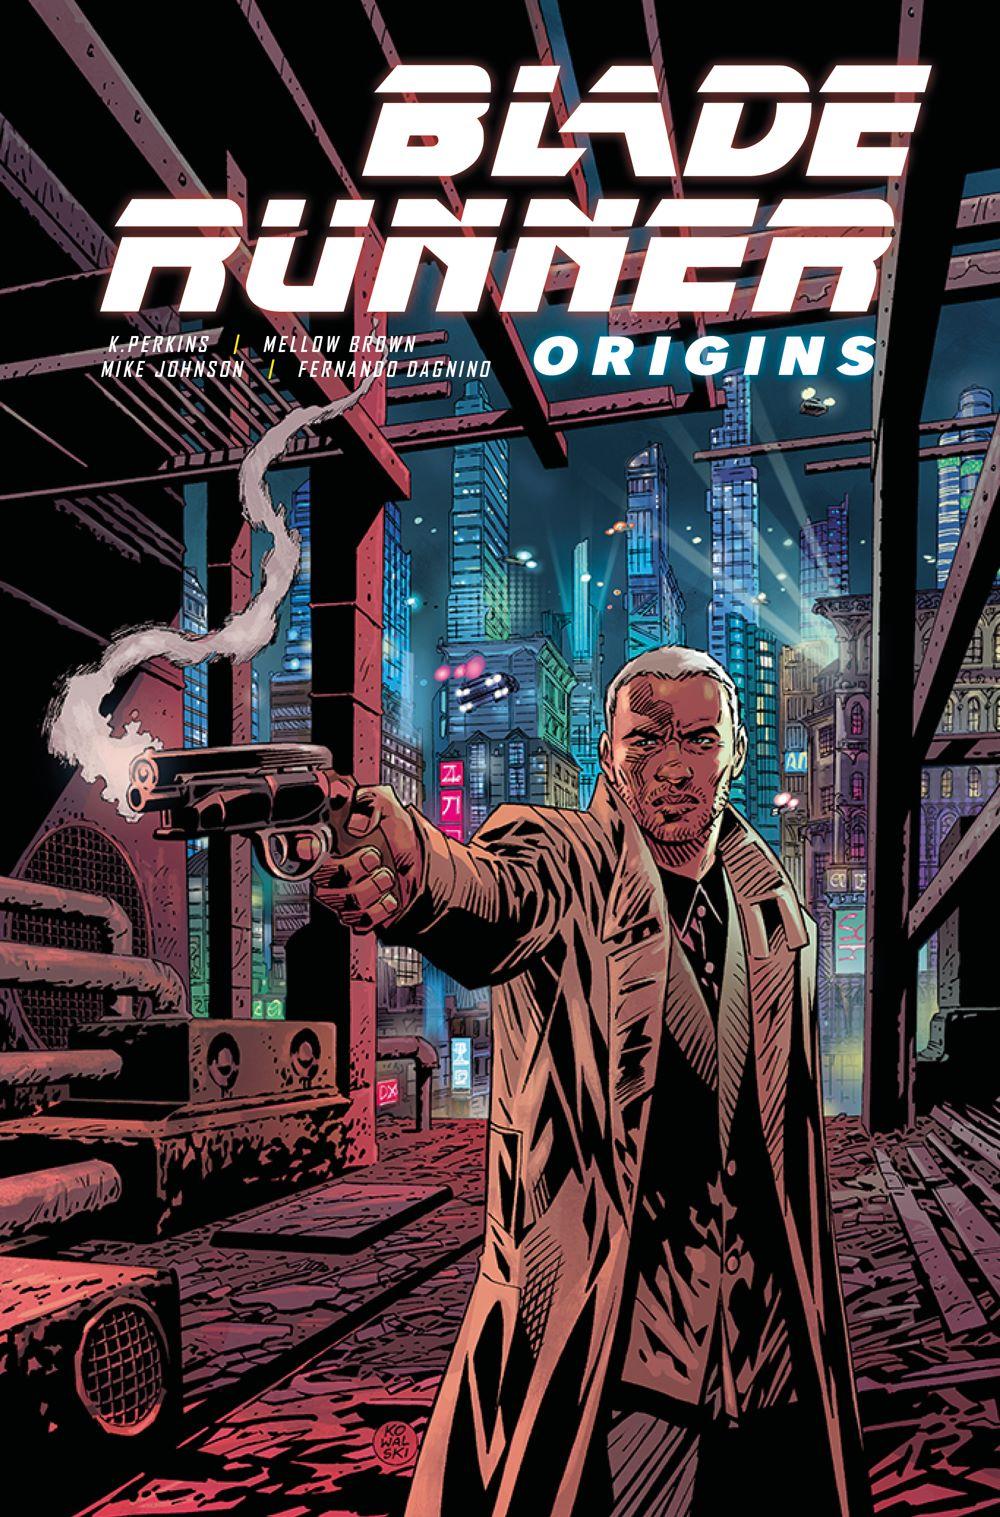 Blade-Runner-Origins_1_E_PIOTR-KOWALSKI ComicList: Titan Comics New Releases for 03/10/2021